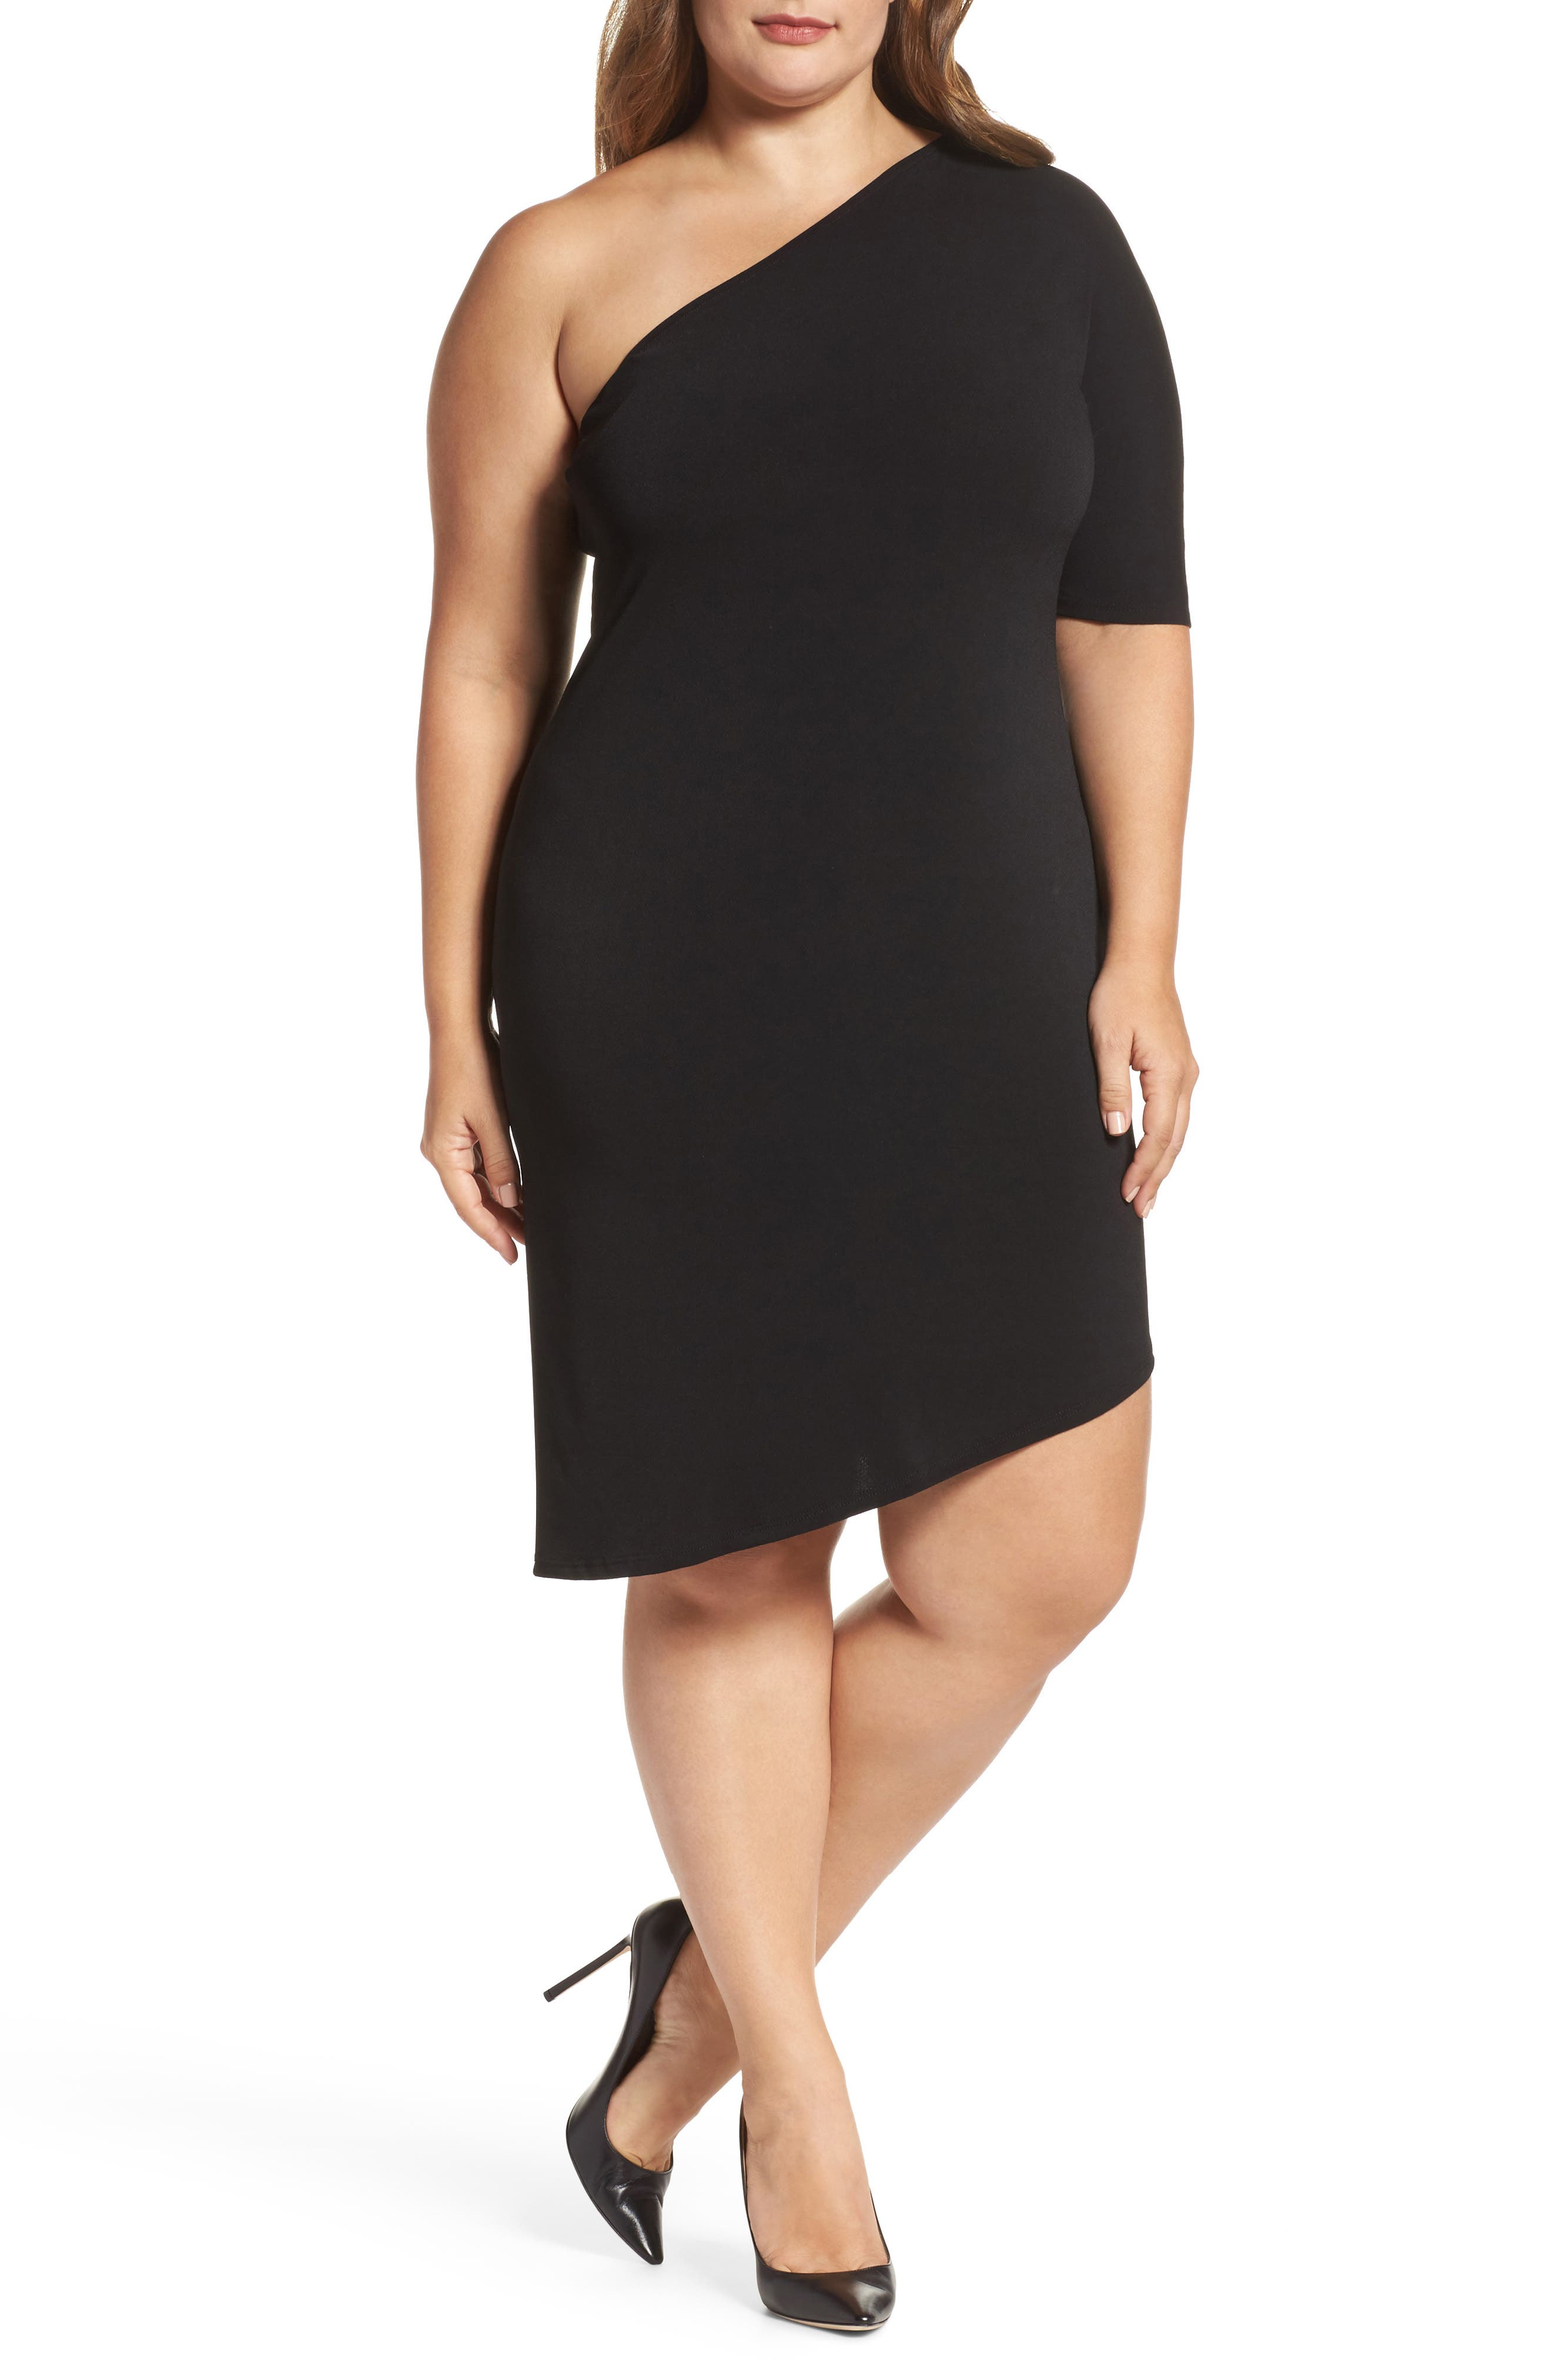 Leota Christina One-Shoulder Dress (Plus Size)